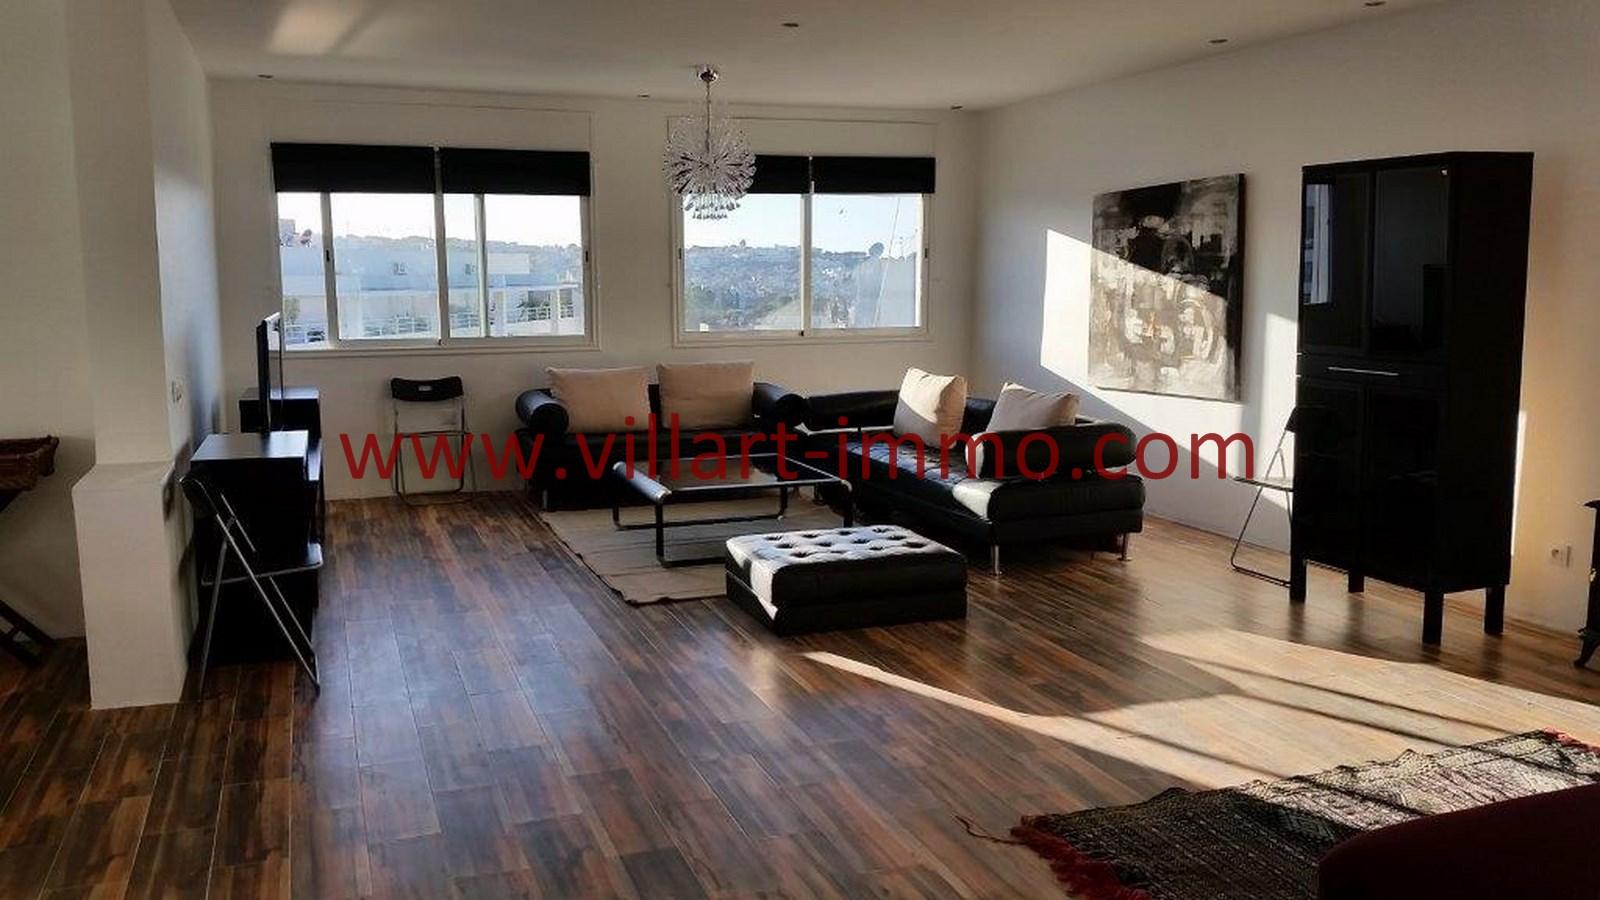 3-Vente-Appartement-Tanger-Centre-De-Ville-Salon 1-VA518-Villart Immo